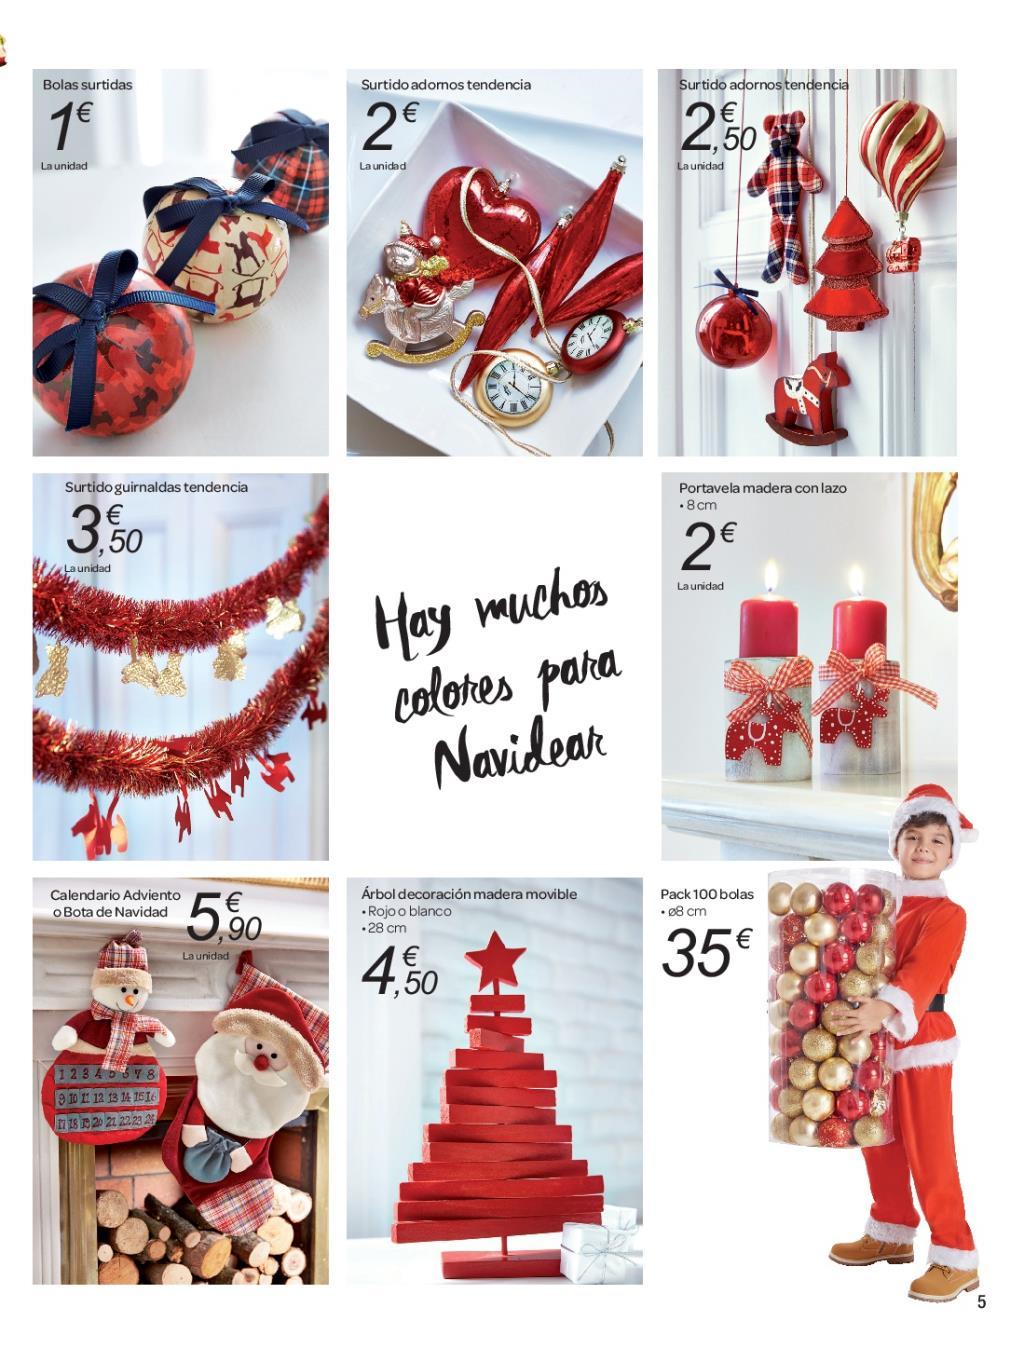 Iluminacion Baño Carrefour:Adornos de Navidad Carrefour 2015 (5/16)